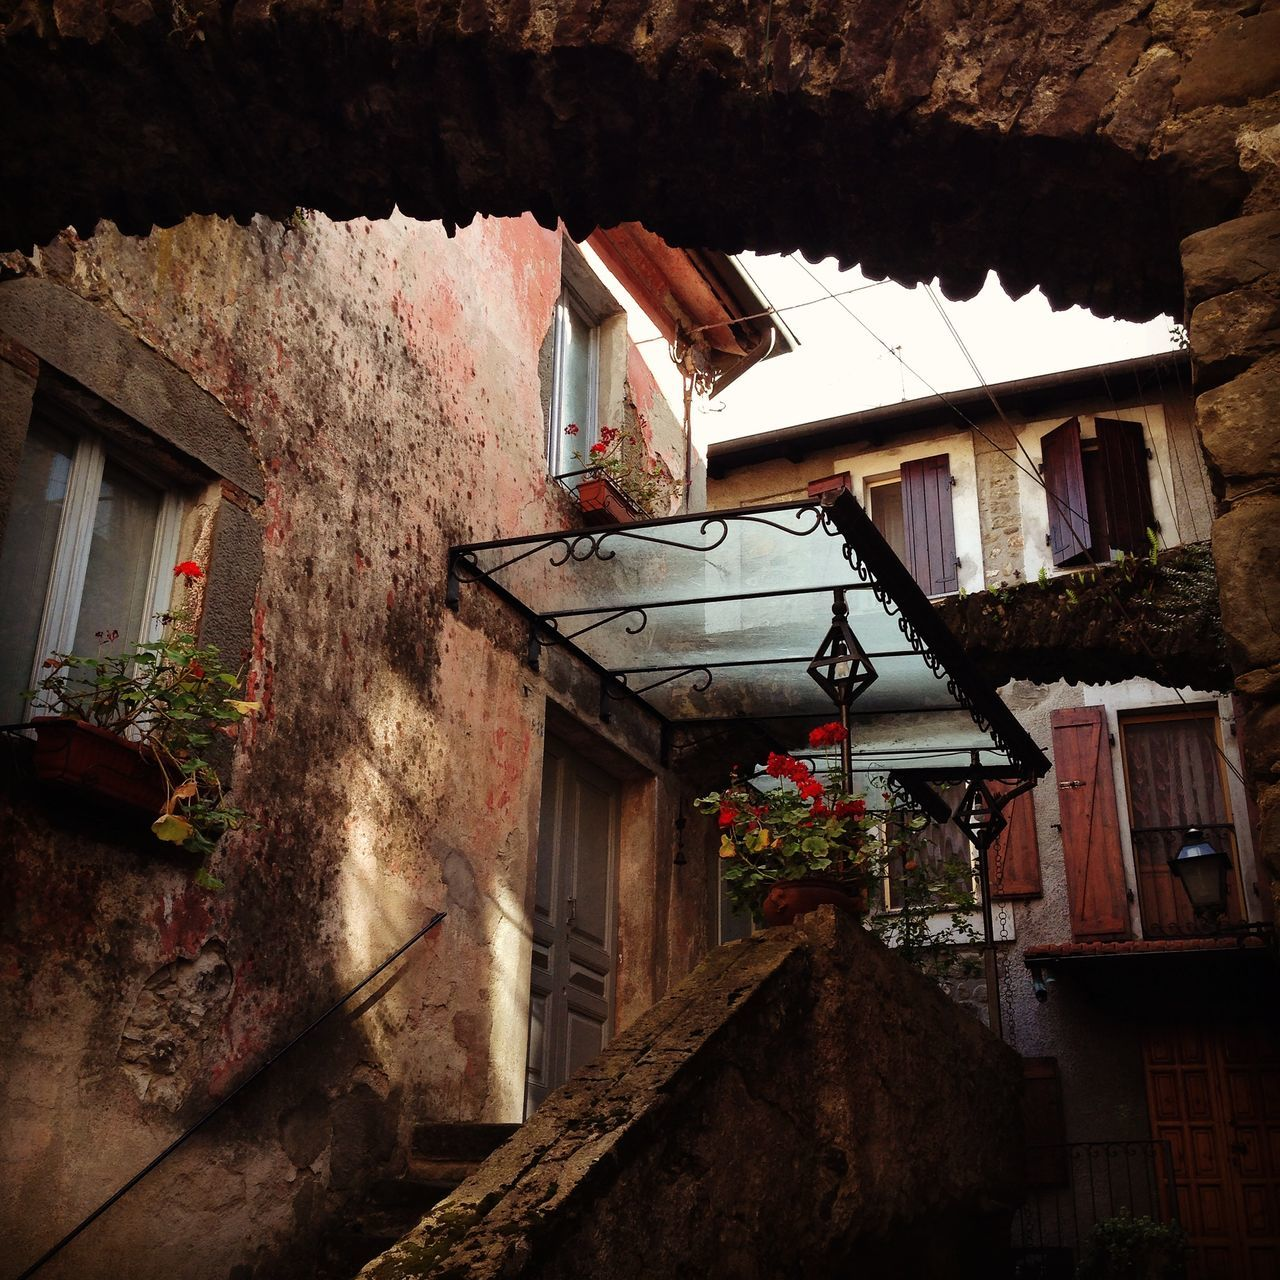 Filetto Tuscany Toscana Stone House Flowers Taking Photos Italy Girl